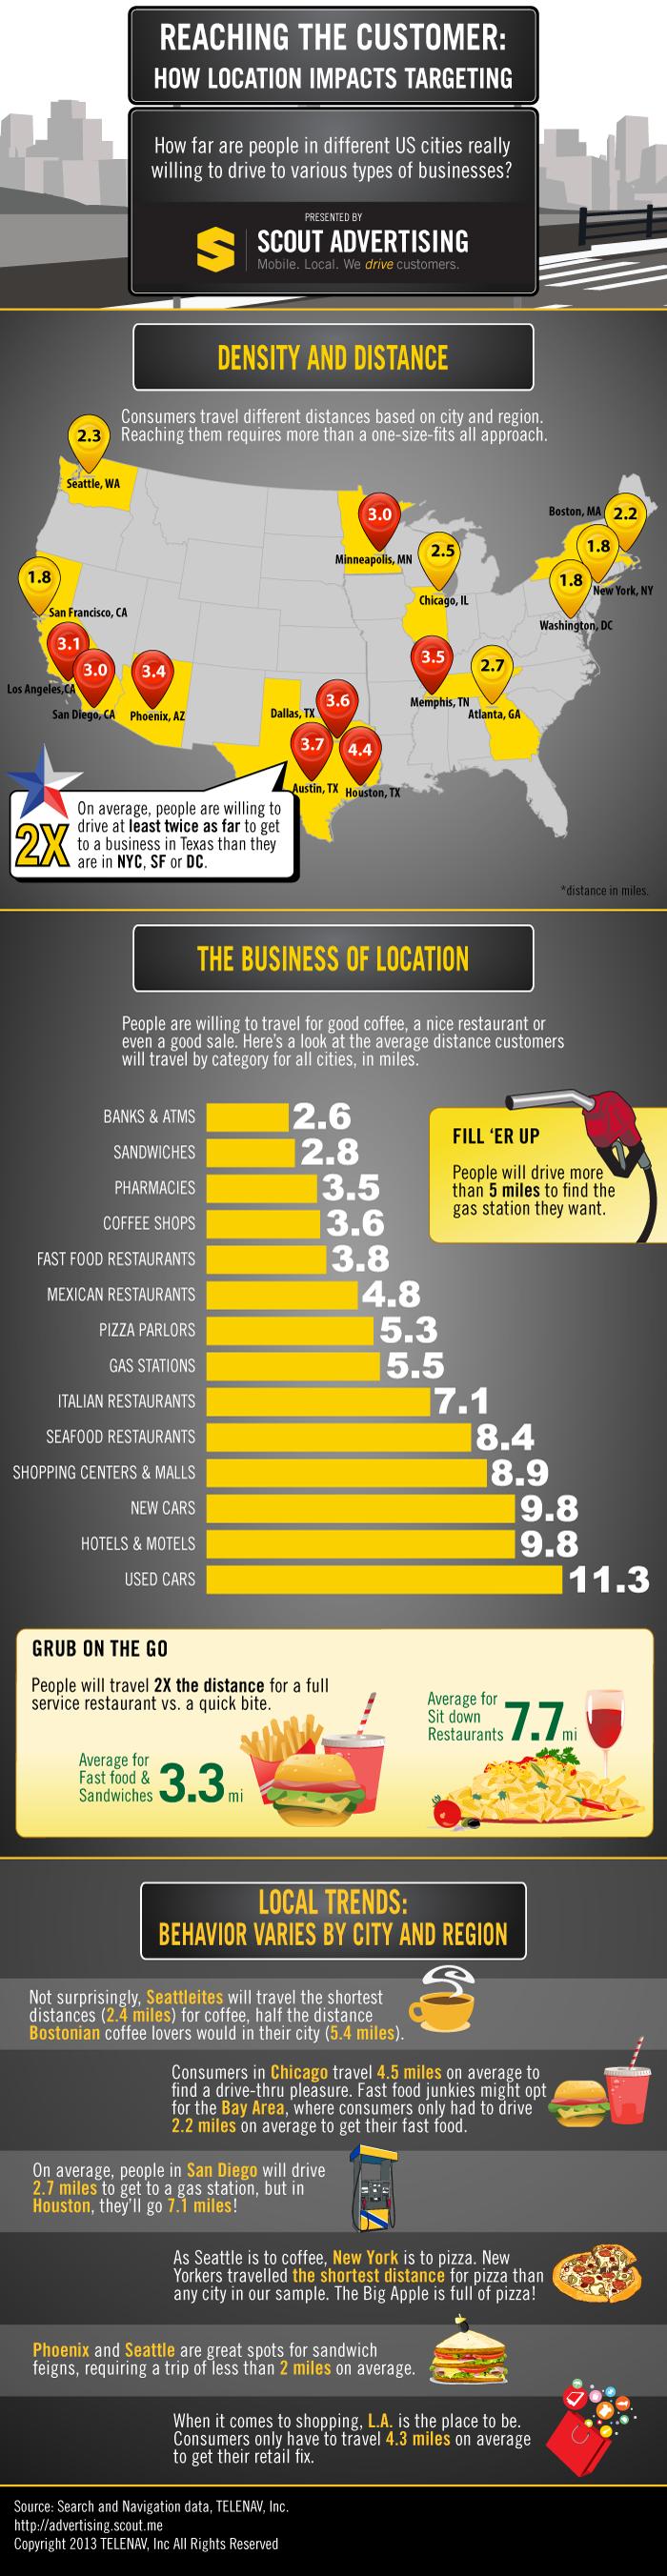 infographic_howlocationimpactstargeting